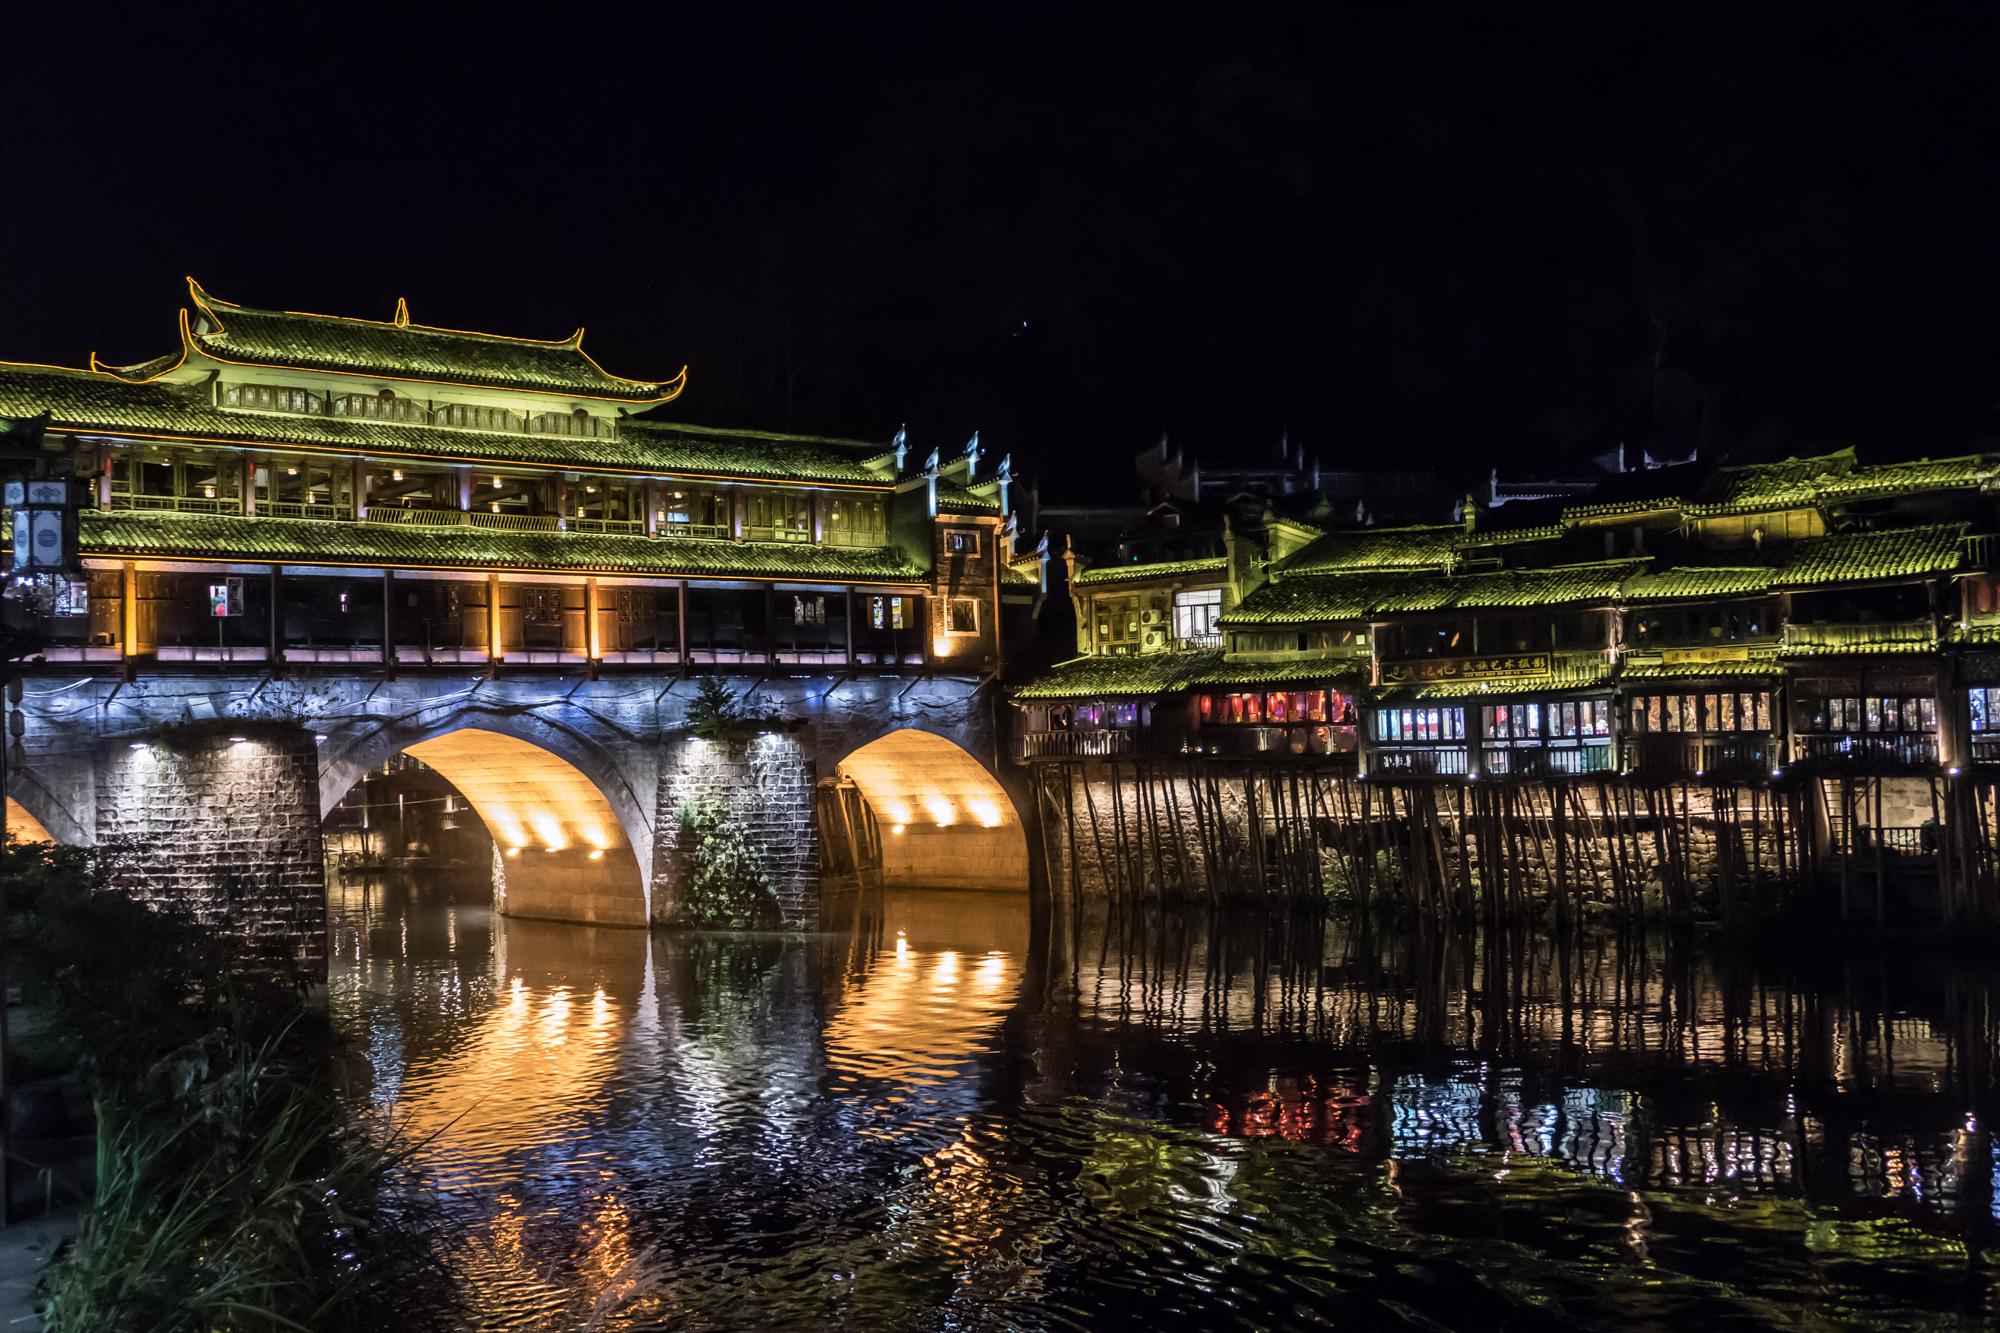 Fenghuang bridge at night